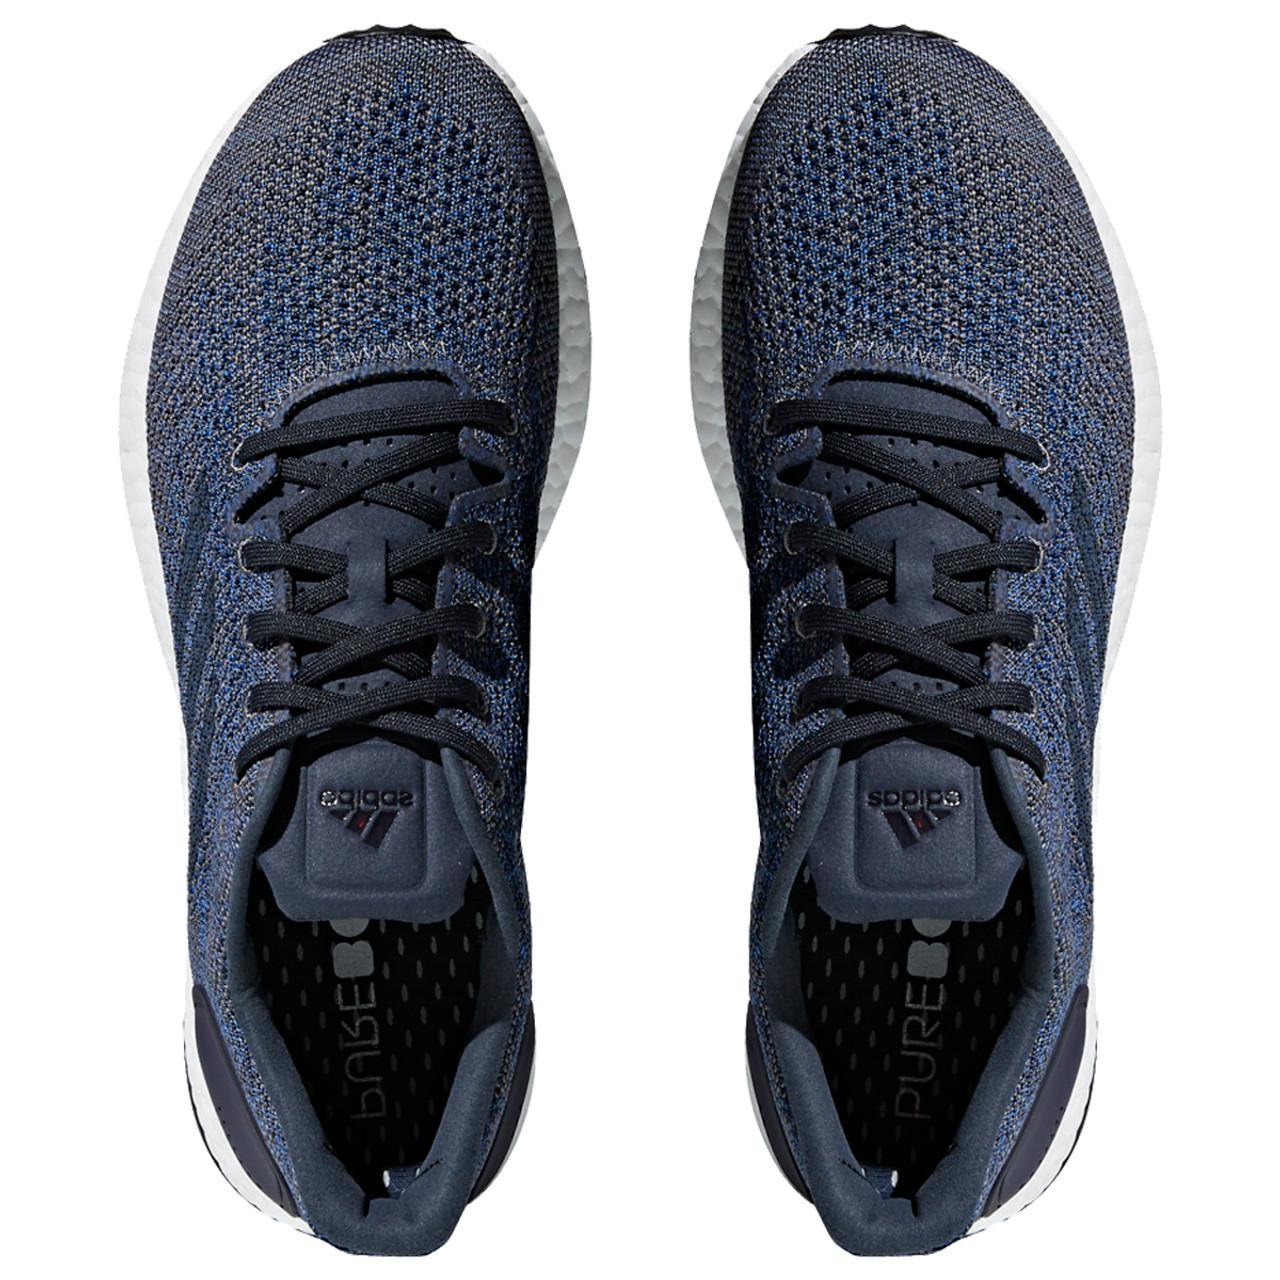 e172d5c3b Adidas PureBOOST DPR Men s Sneakers BB6293 - Gray